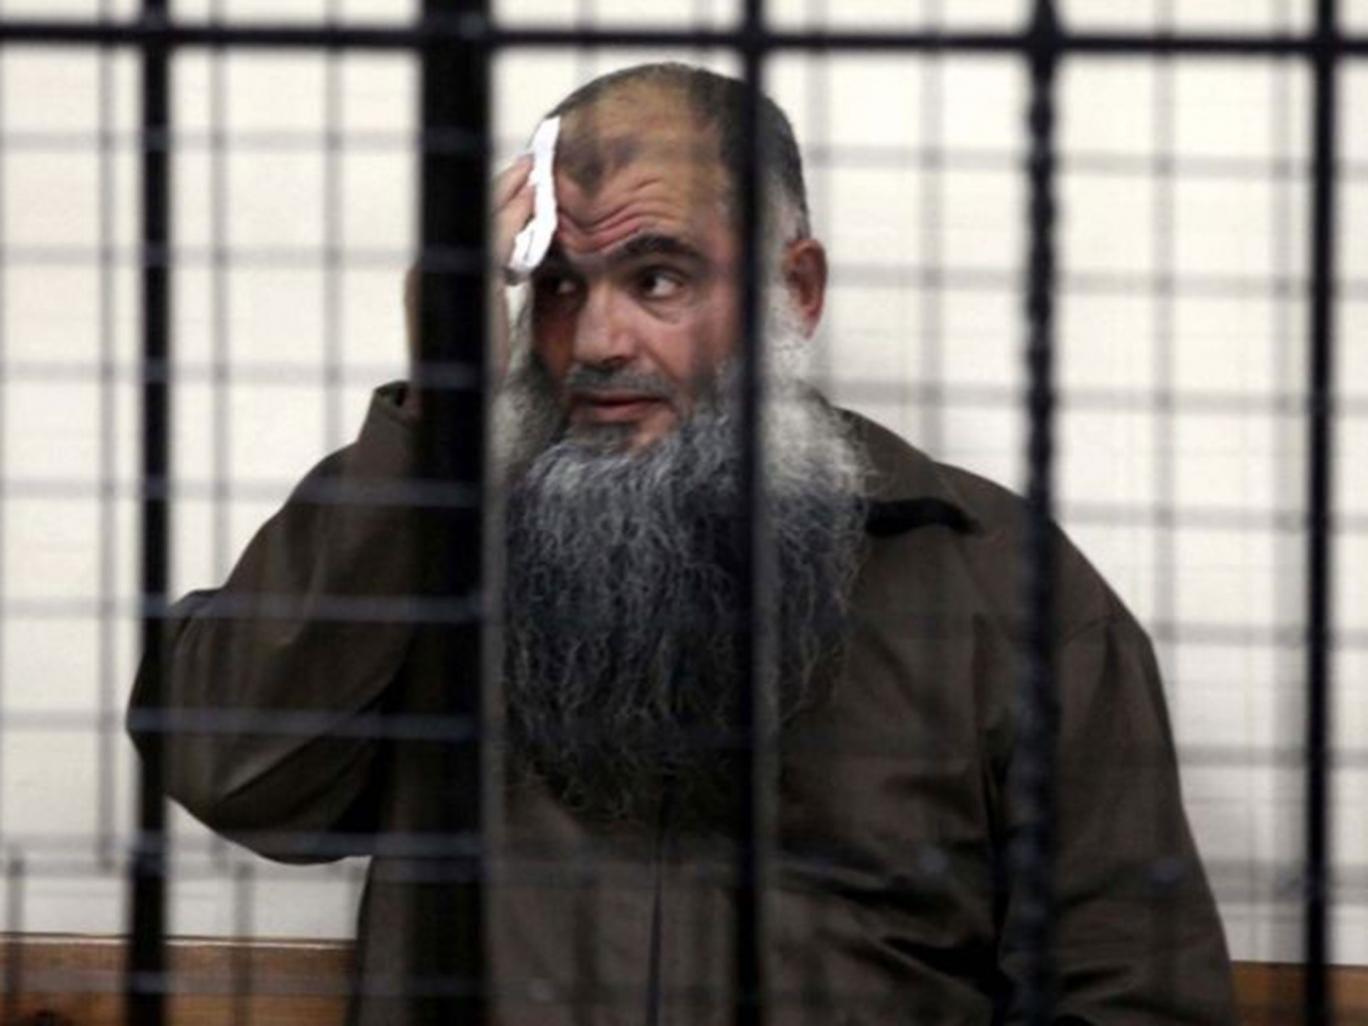 Abu Qatada behind bars in court. The radical Islamist preacher will not be allowed to return to Britain.